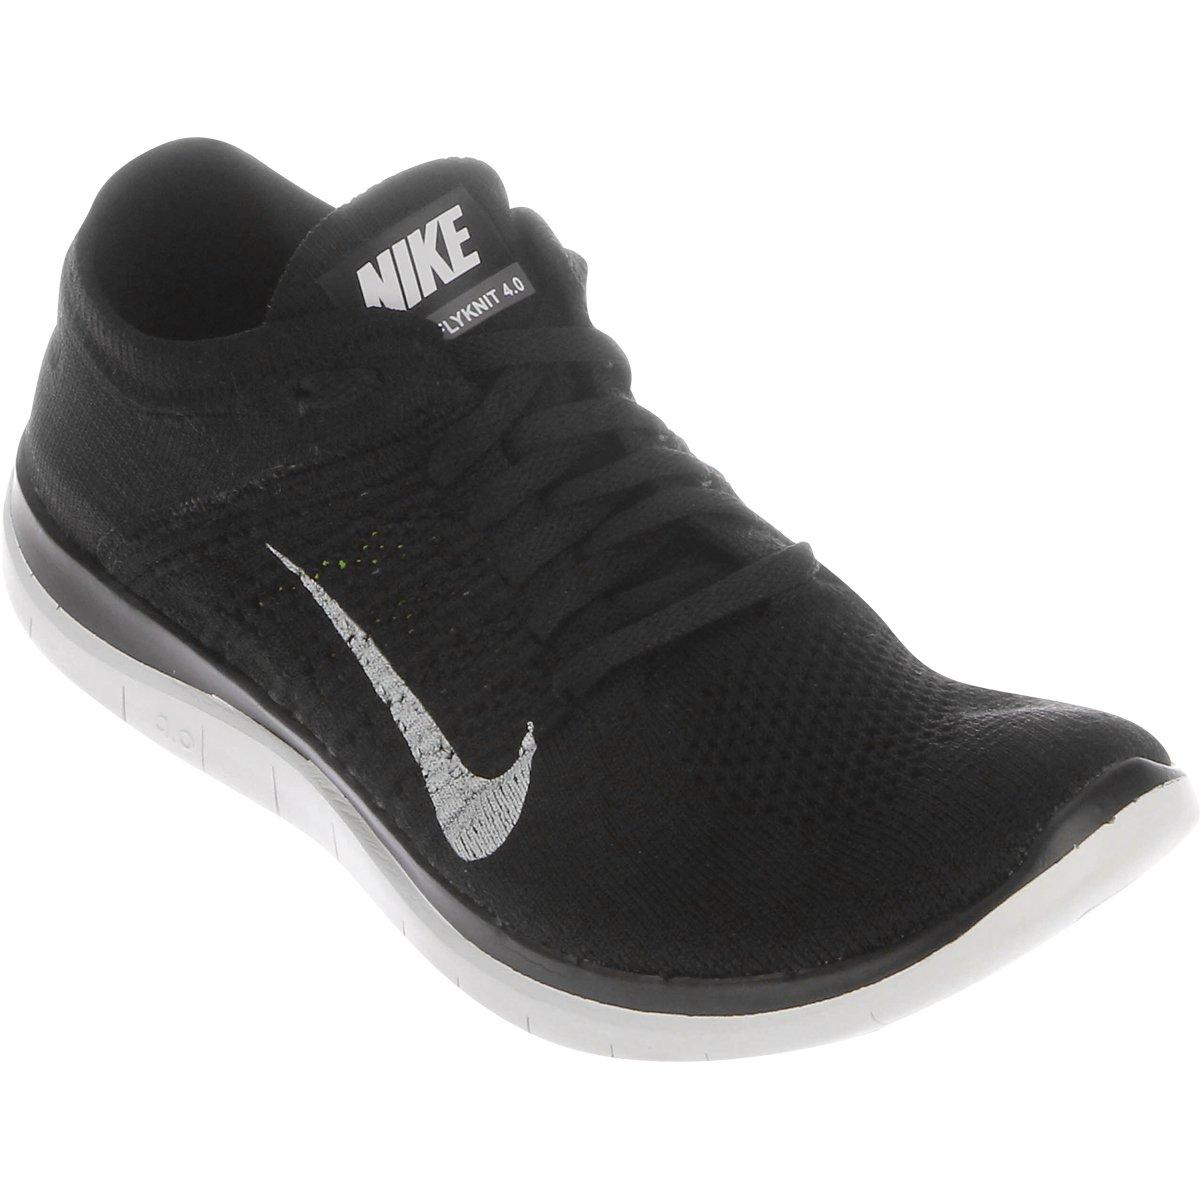 Tênis Compre Nike Free Flyknit 4.0 Compre Tênis Agora | Netzapatos e3dcde